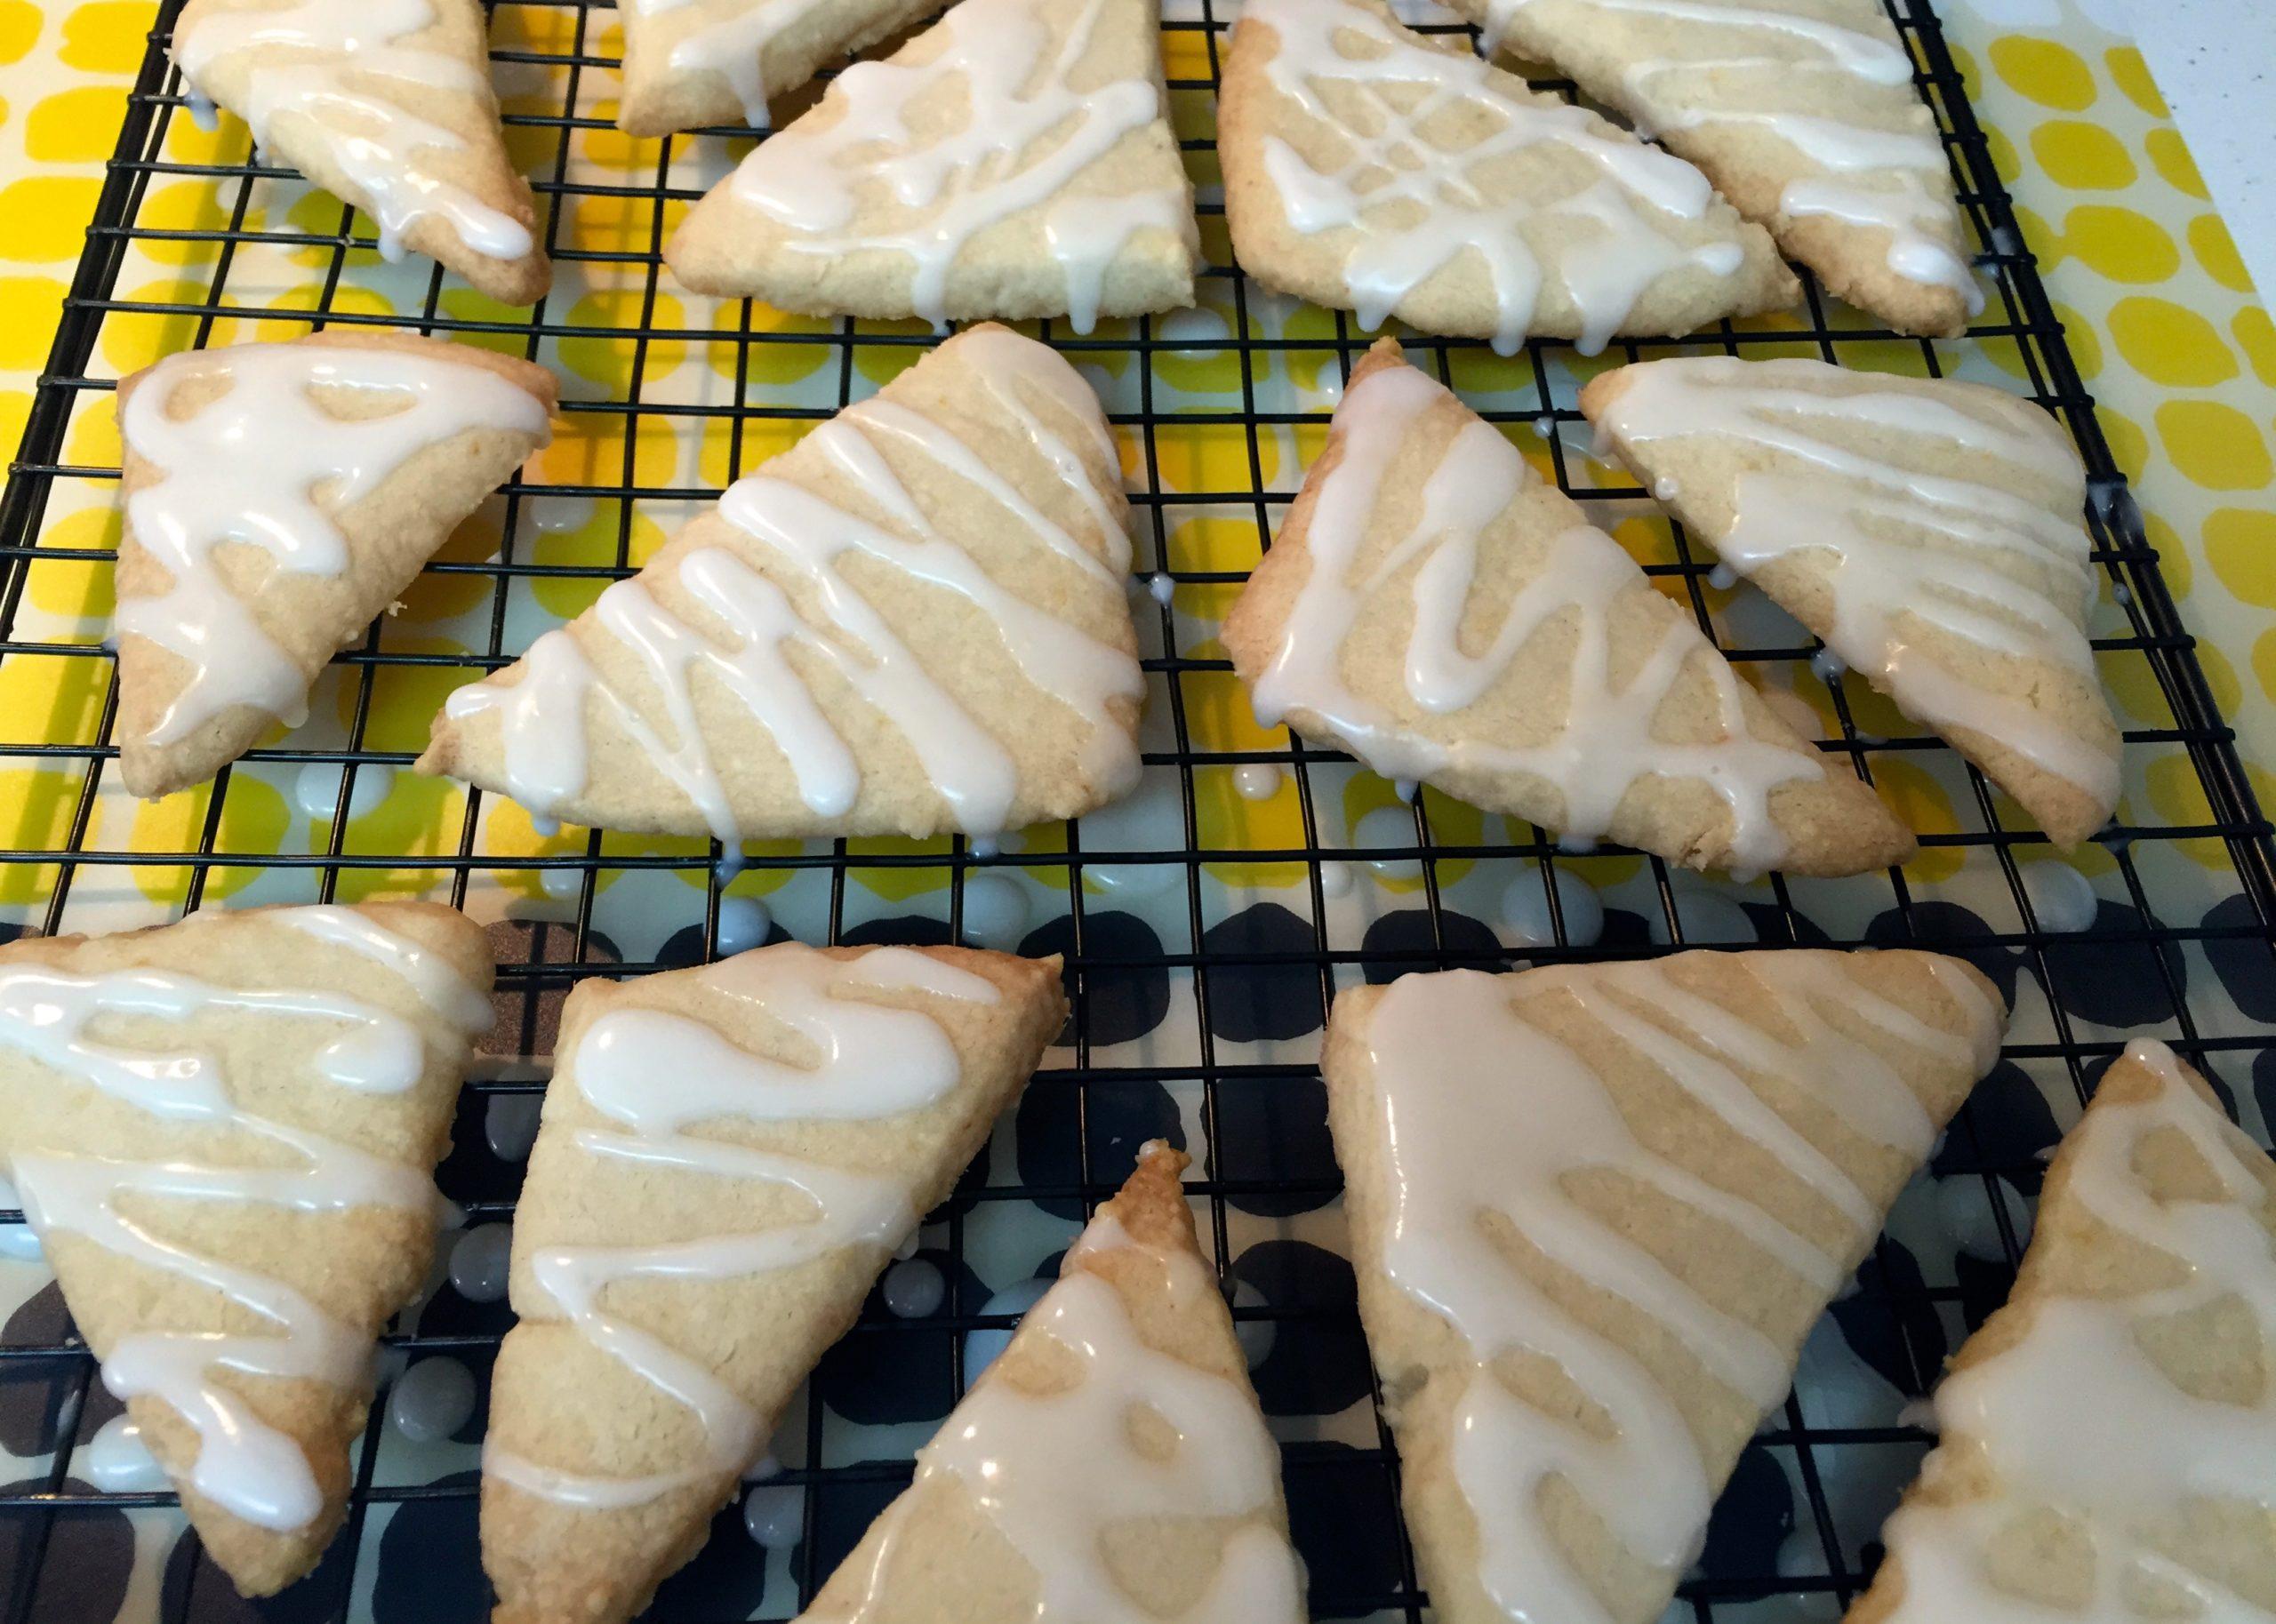 Lemon Cookies iced